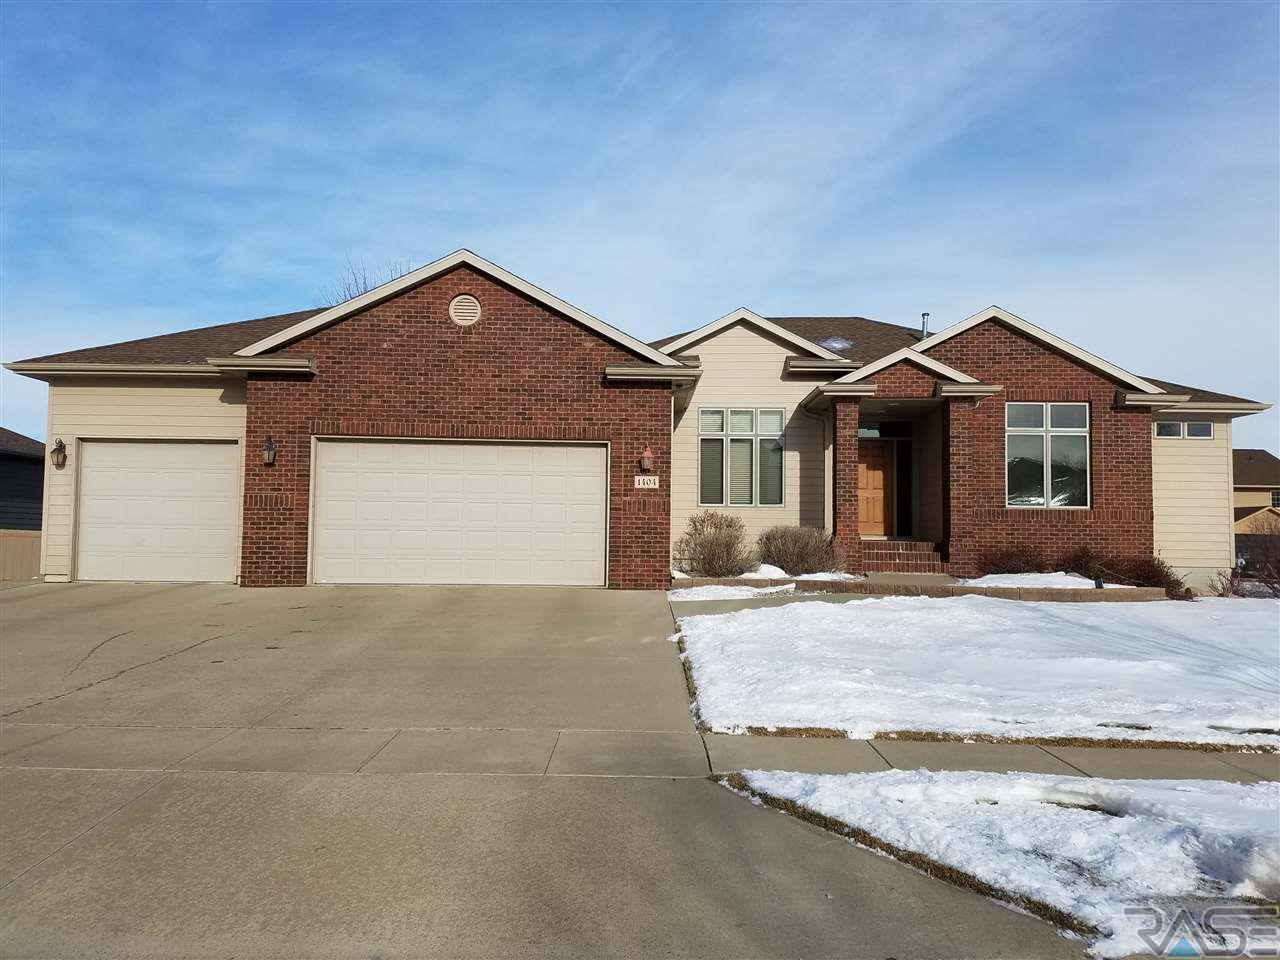 1404 W 71st St, Sioux Falls, SD 57108